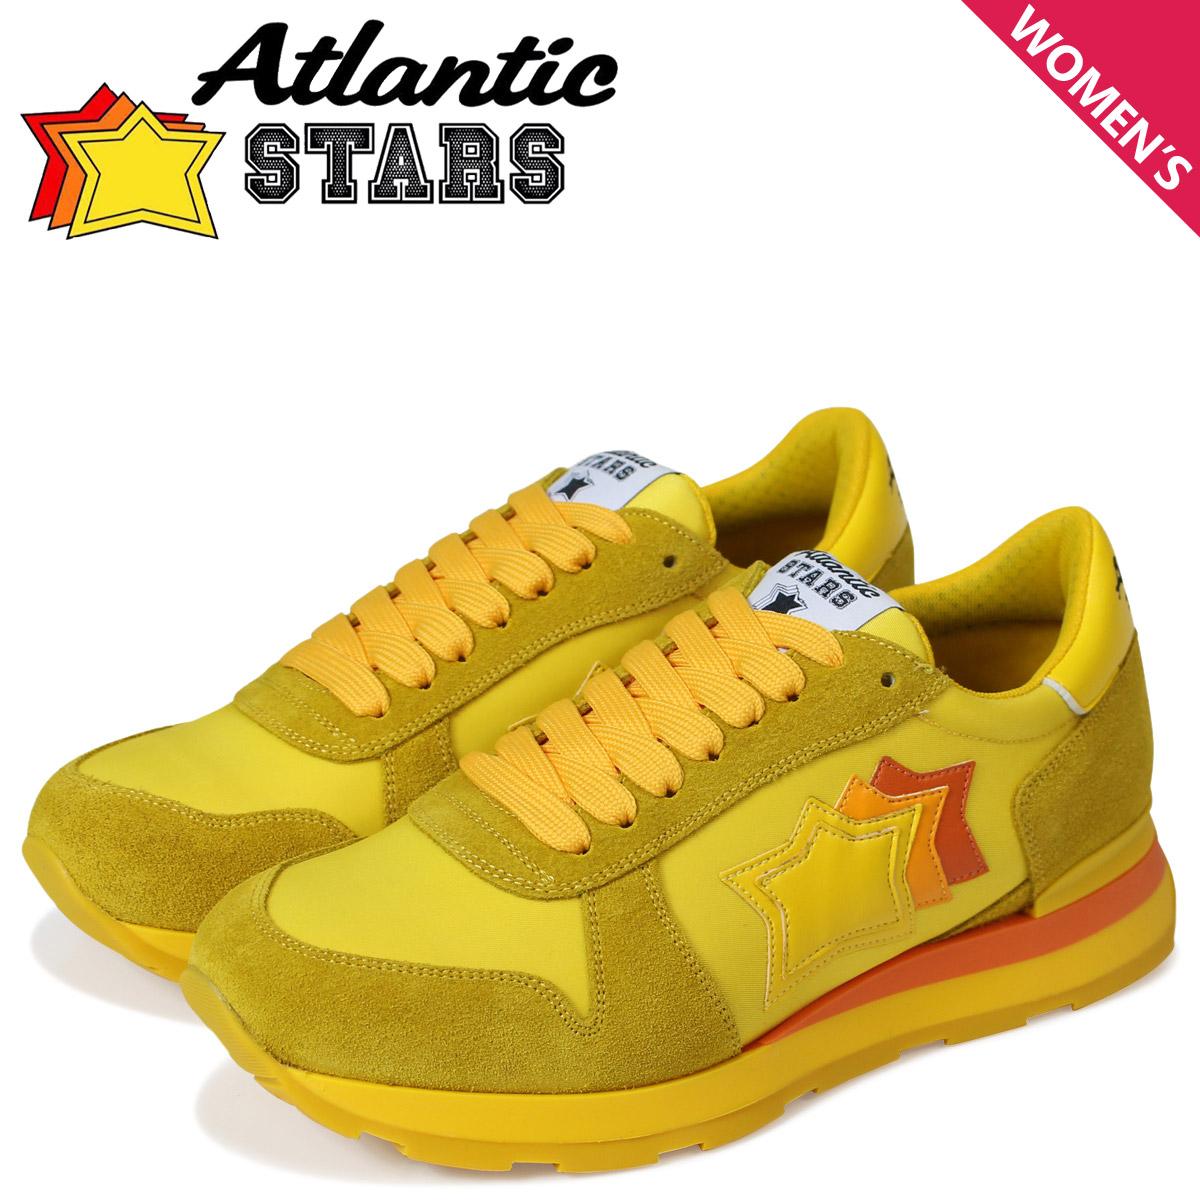 Atlantic STARS レディース スニーカー アトランティックスターズ ジェンマ GEMMA SG46O イエロー